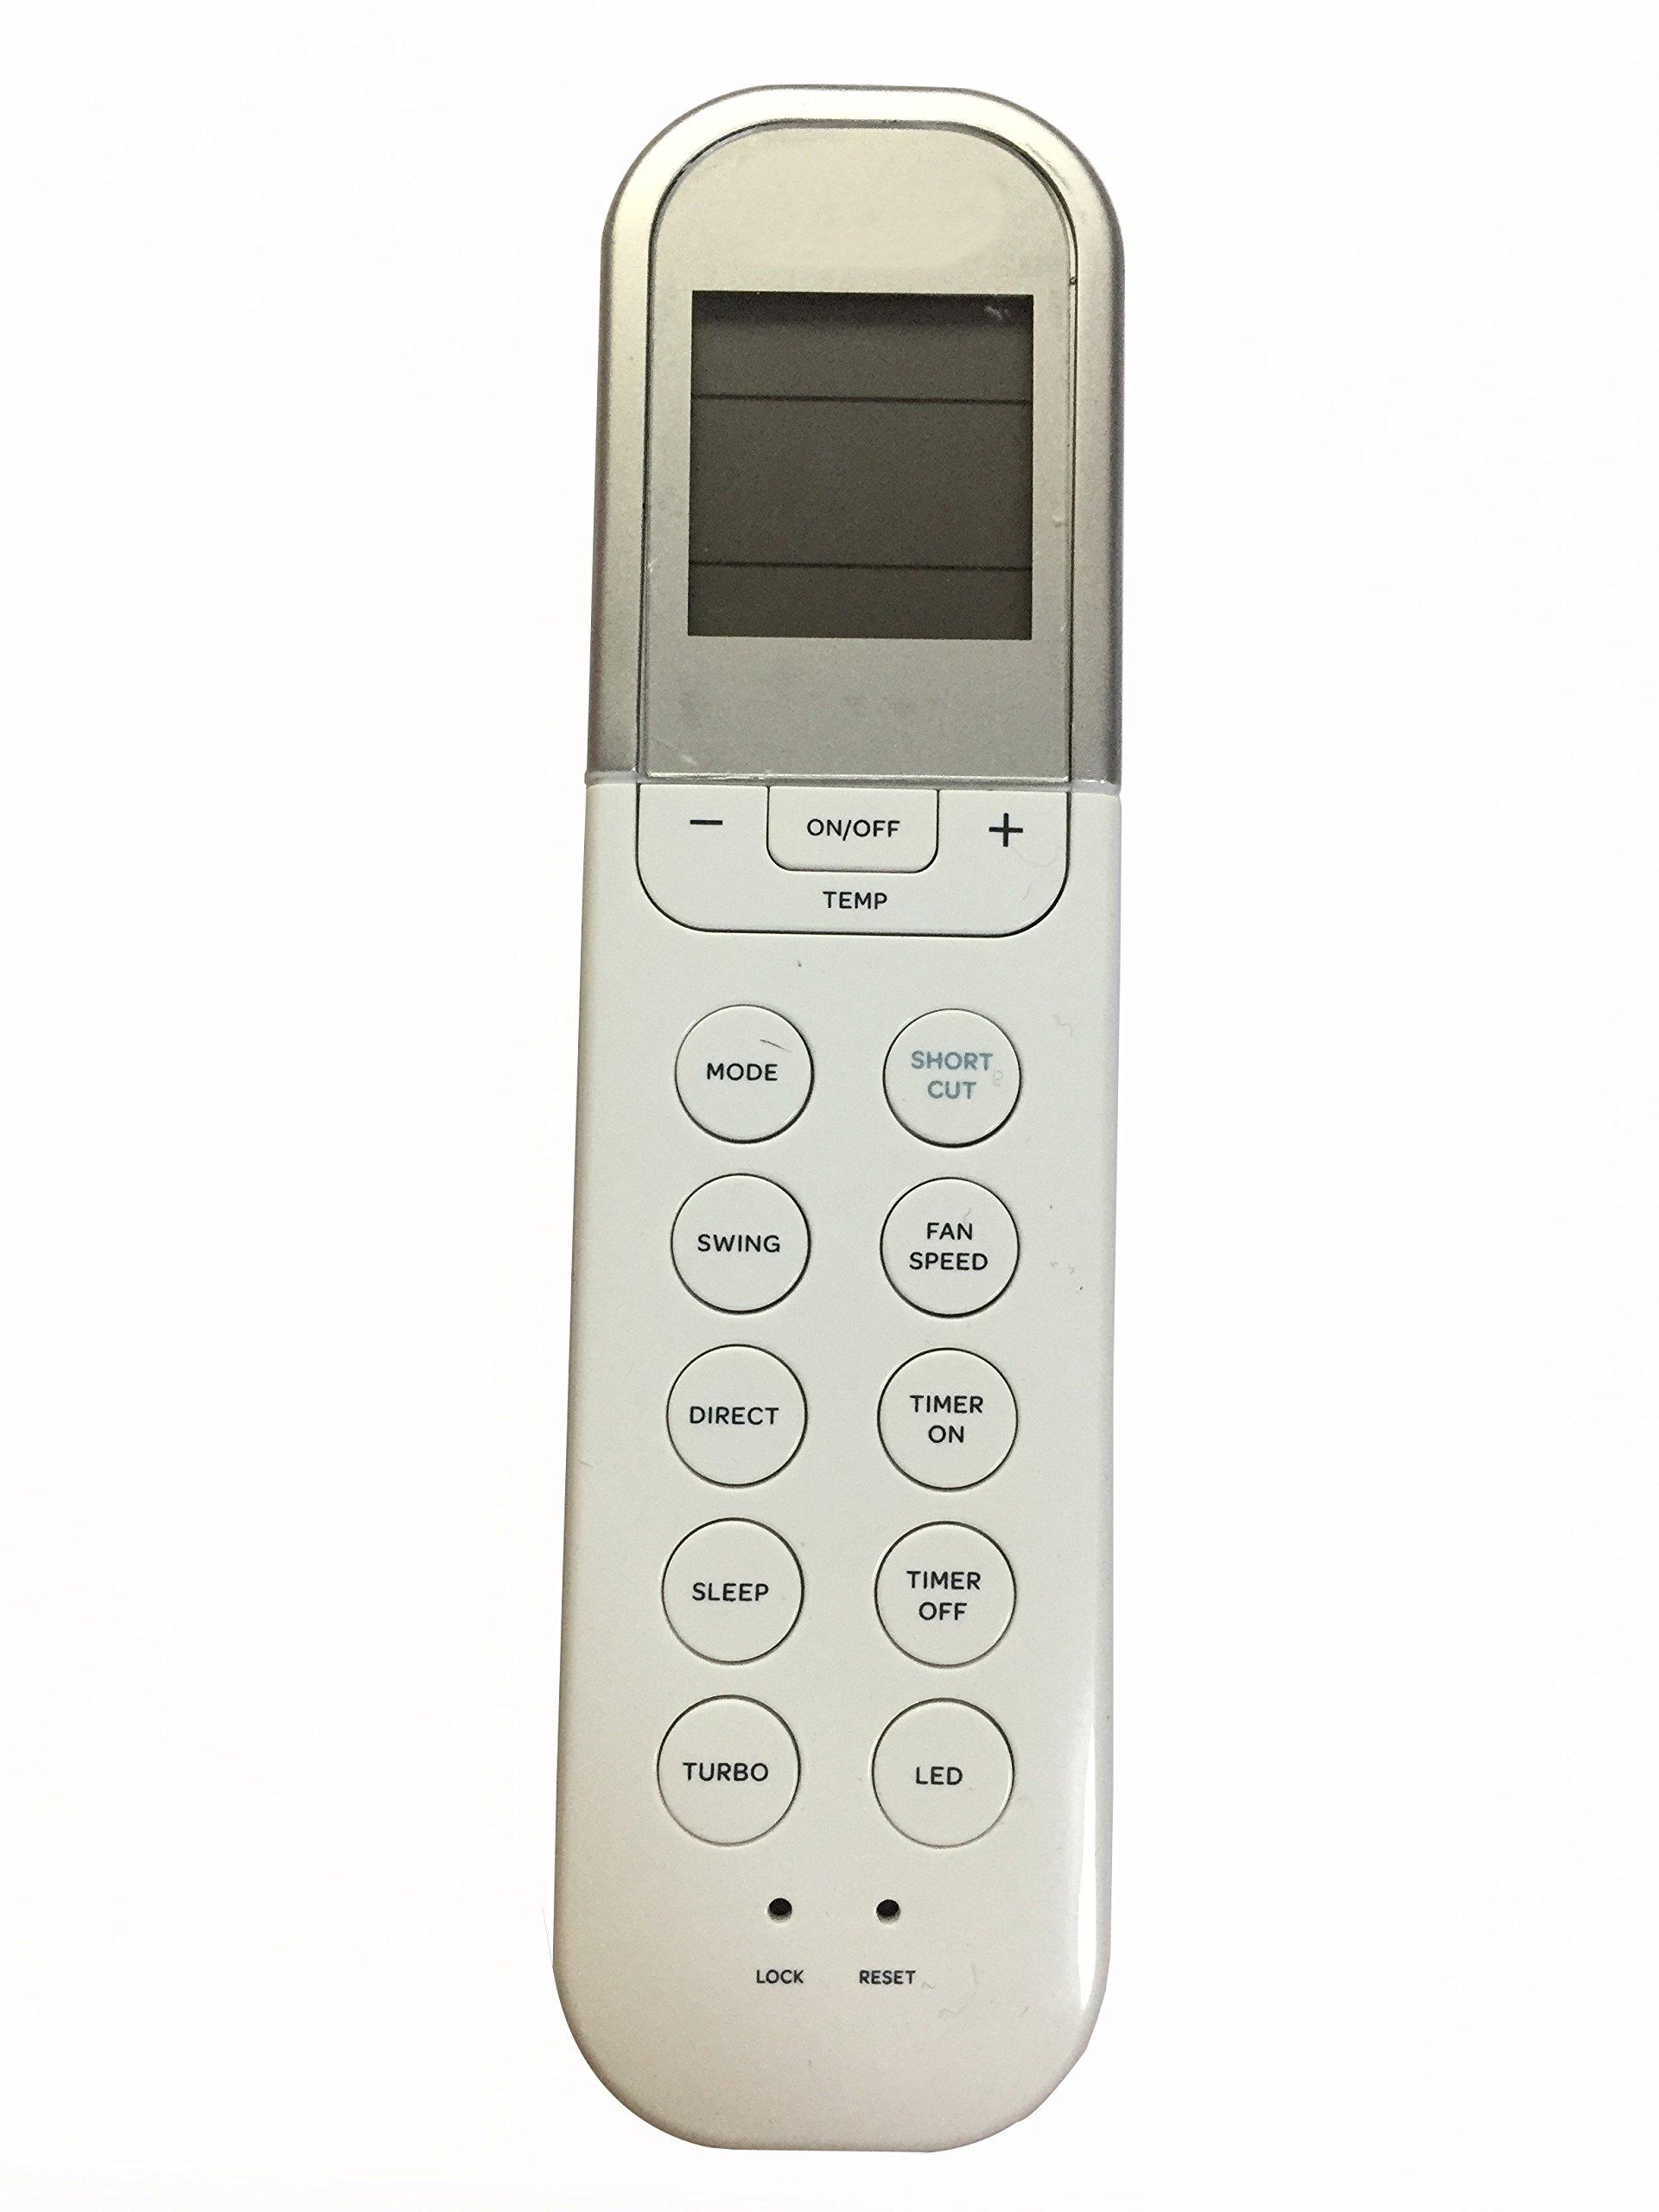 Meide RG36B/BGE AC Remote Control For Midea RG36F/BGEF RG36F/BGEF RG36C/BG(C) E Air Conditioner Air Conditioning Remote Controller